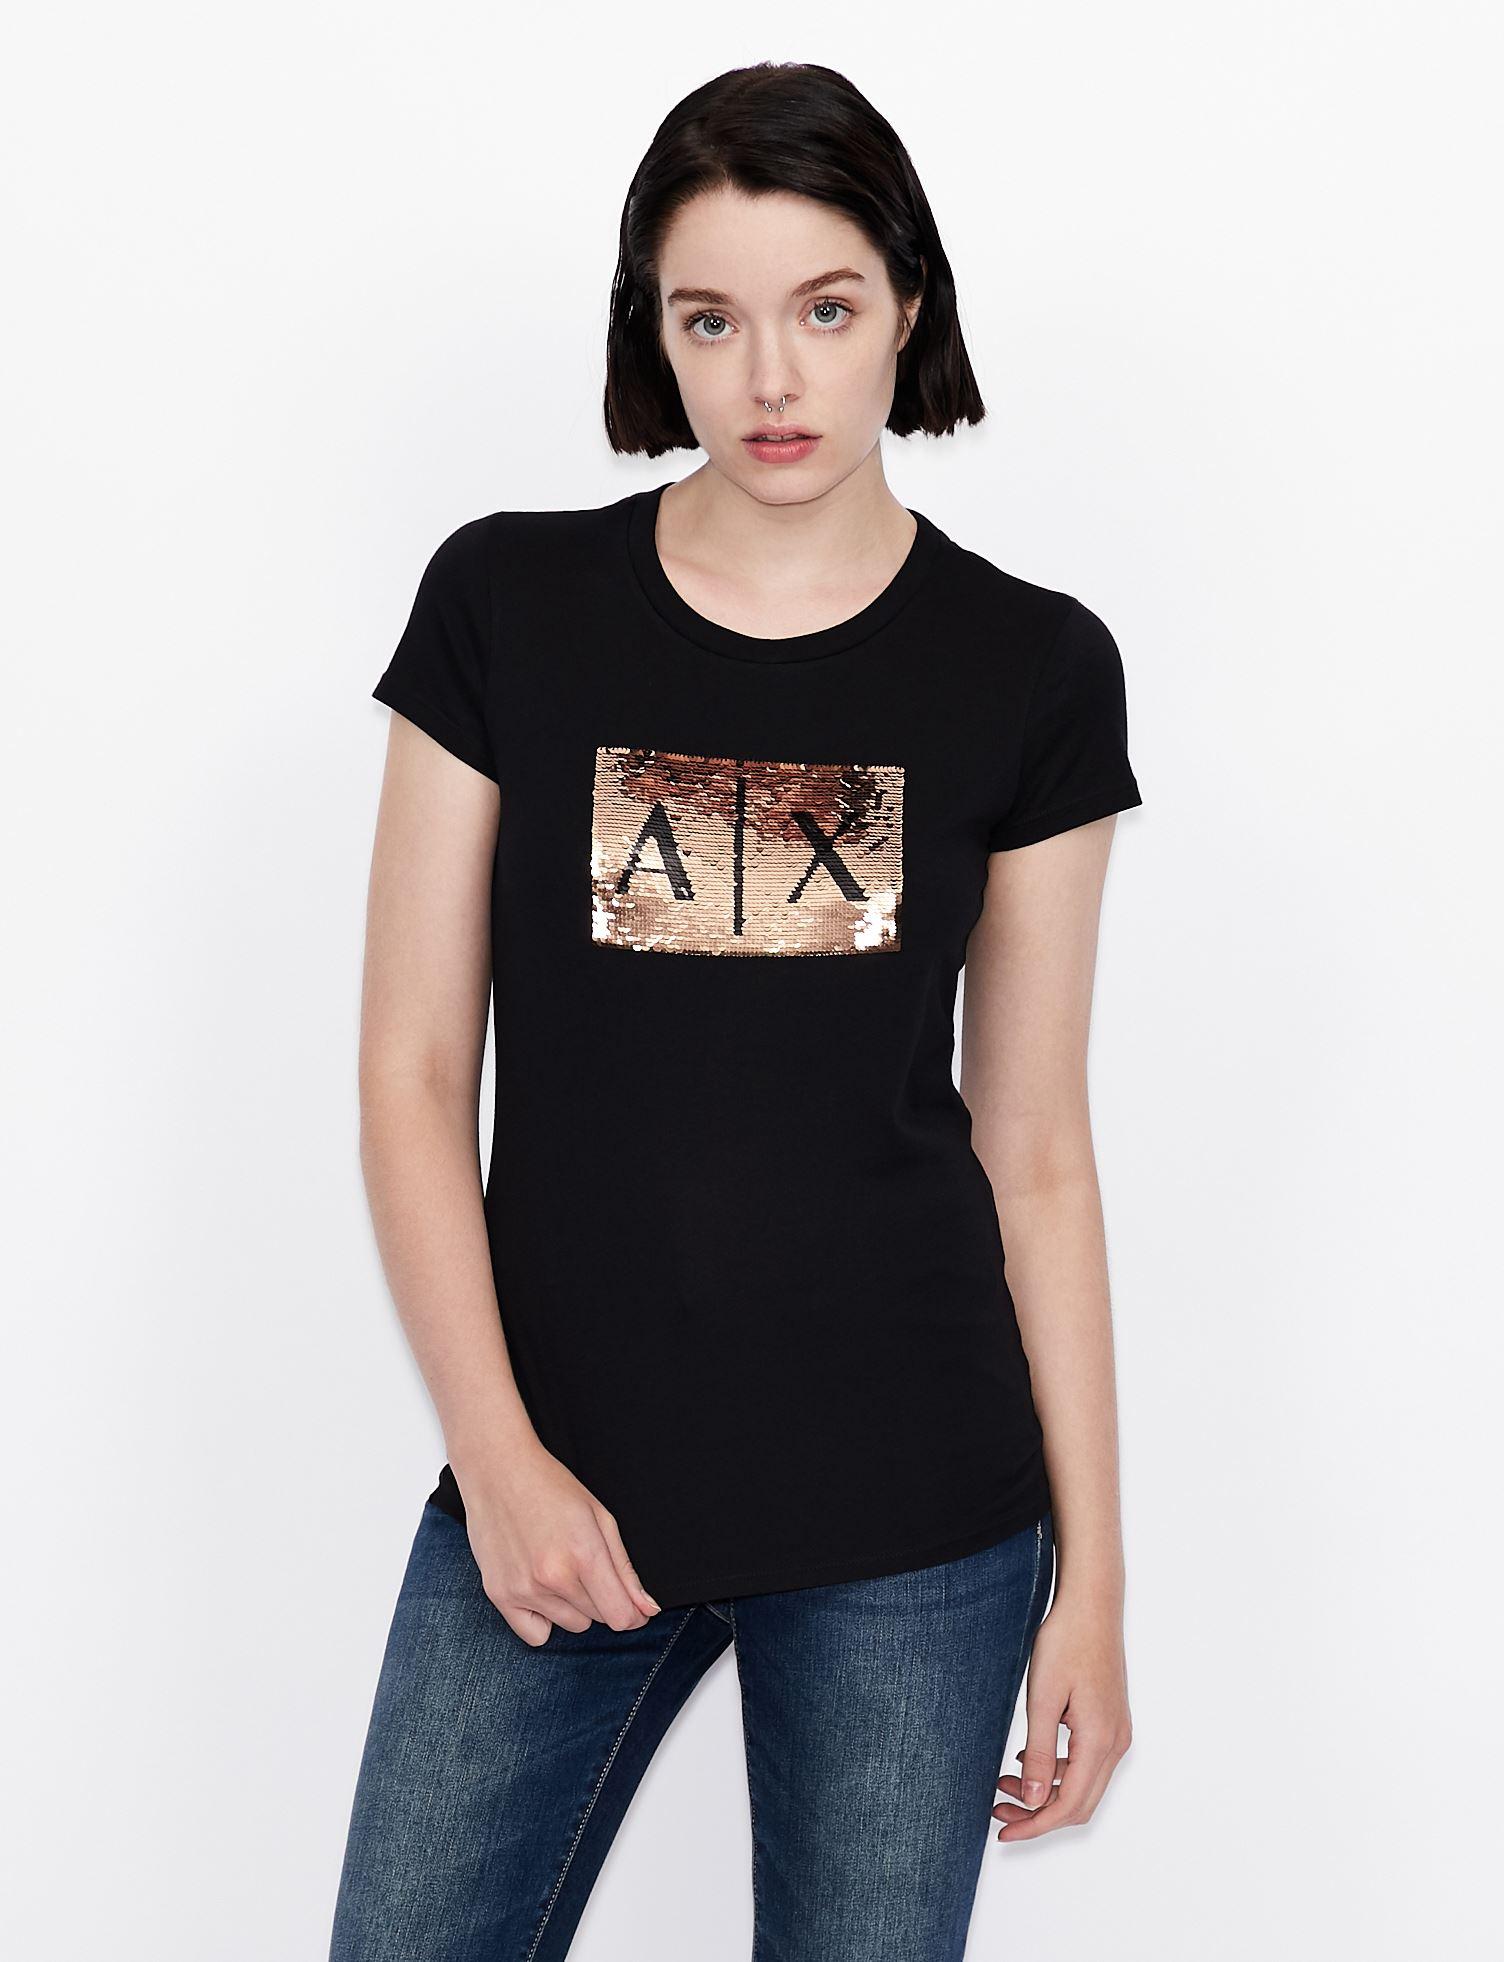 T-shirt slim fit con logo in paillettes Armani Exchange ARMANI EXCHANGE | T-shirt | 8NYTDL-YJ73Z6231